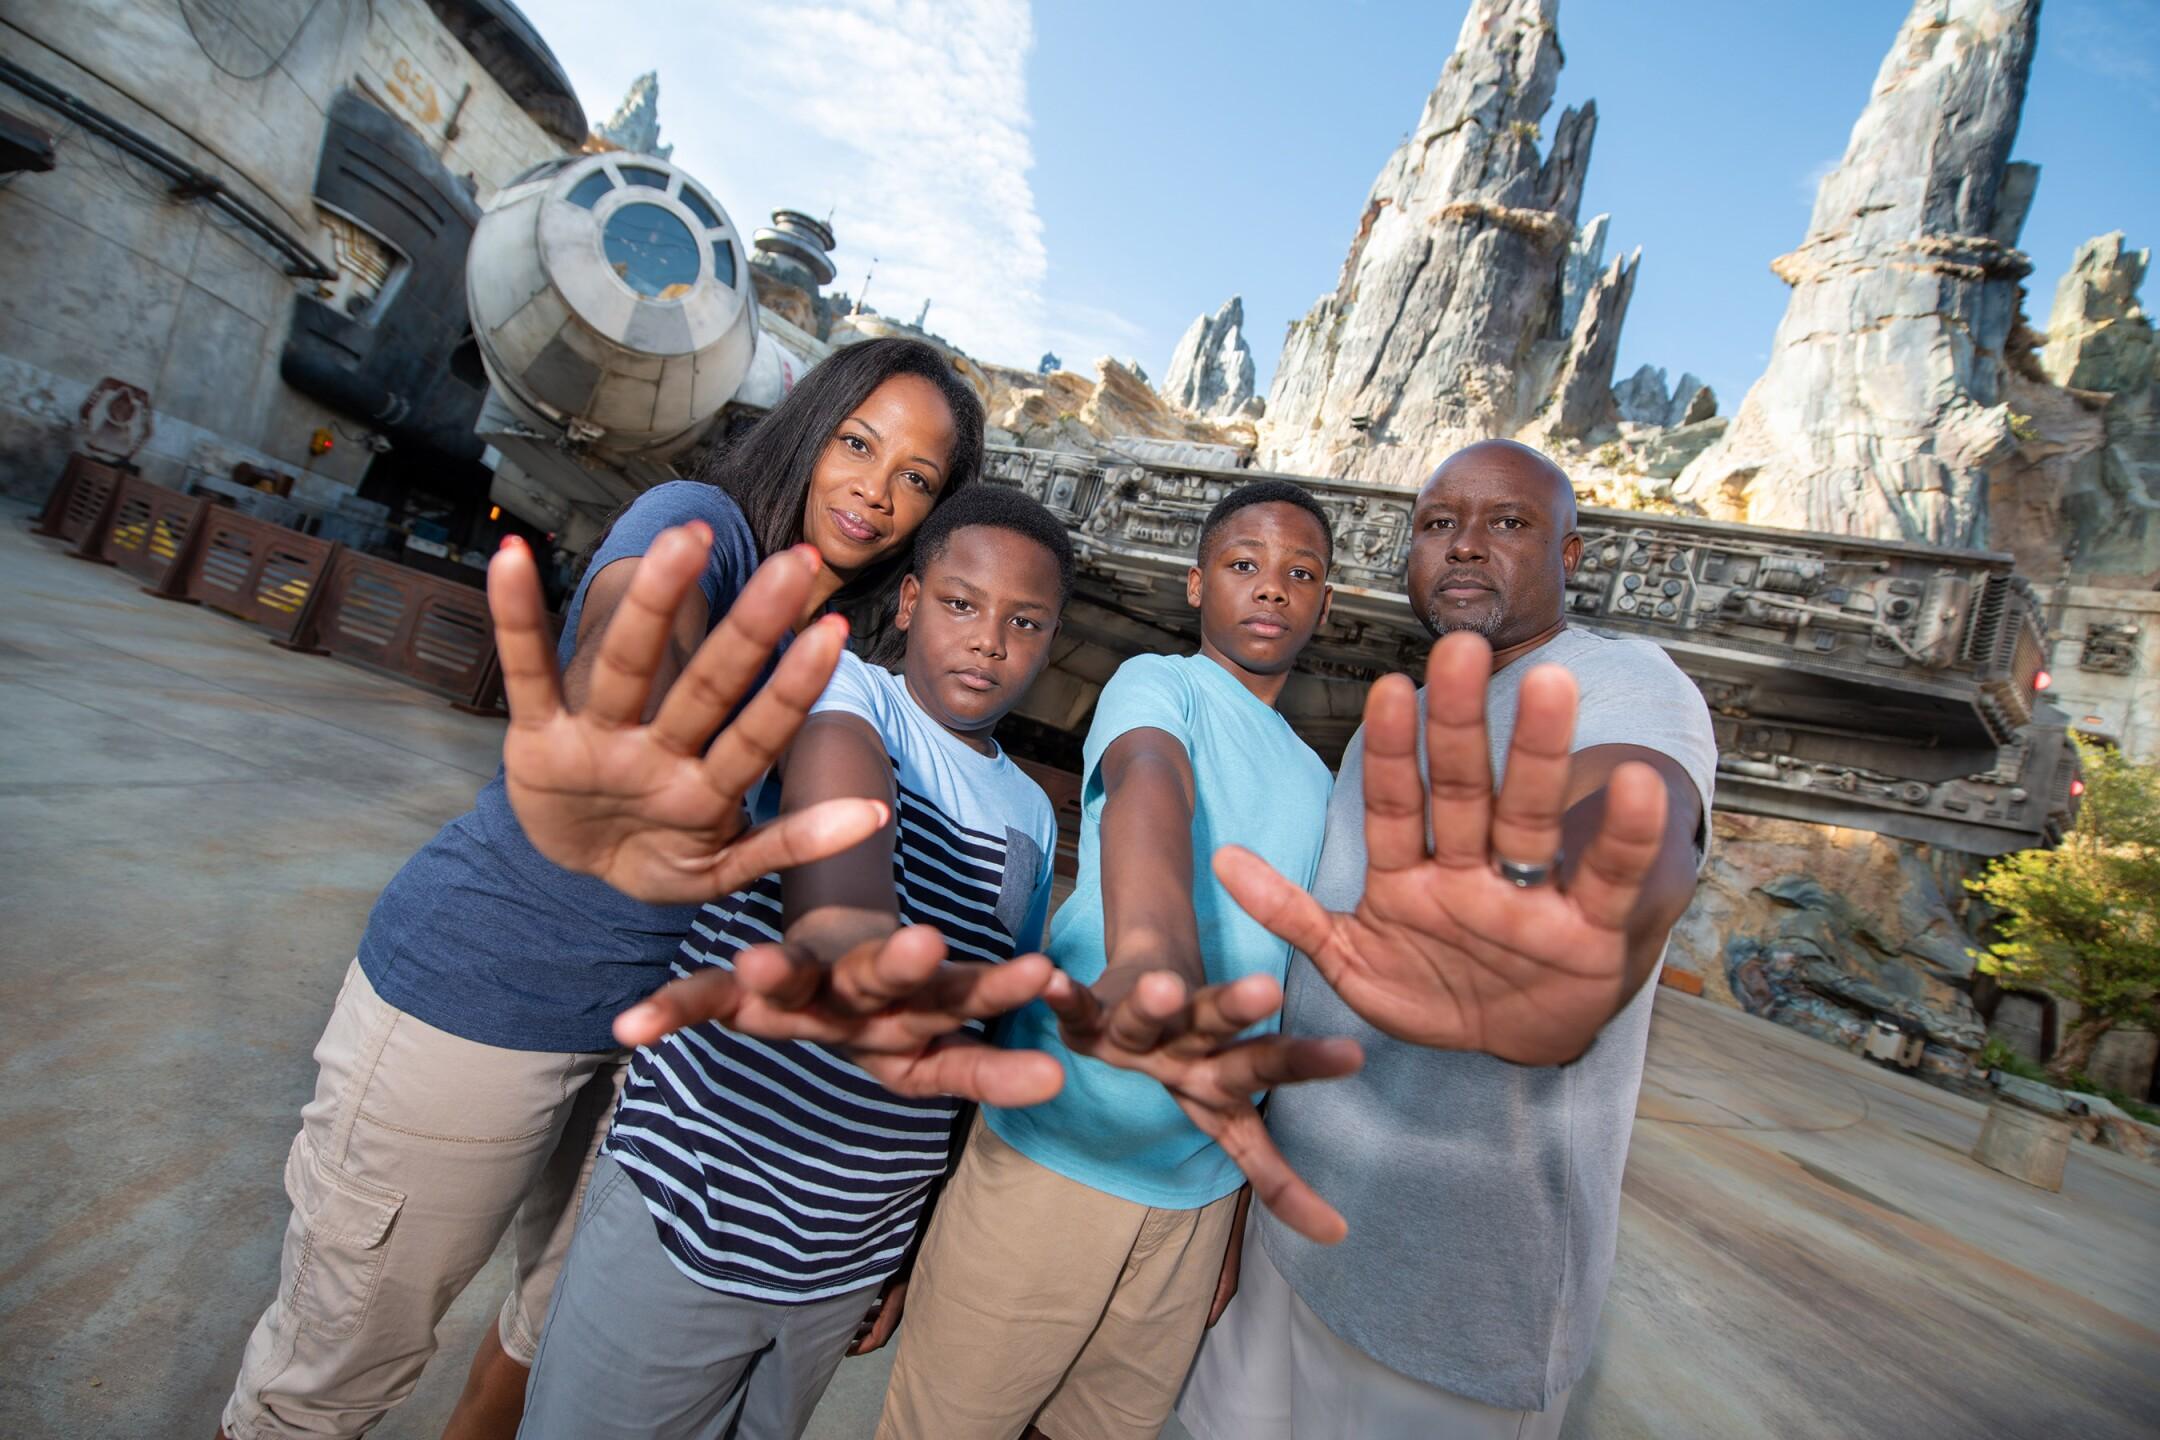 Disney PhotoPass in Star Wars: Galaxy's Edge